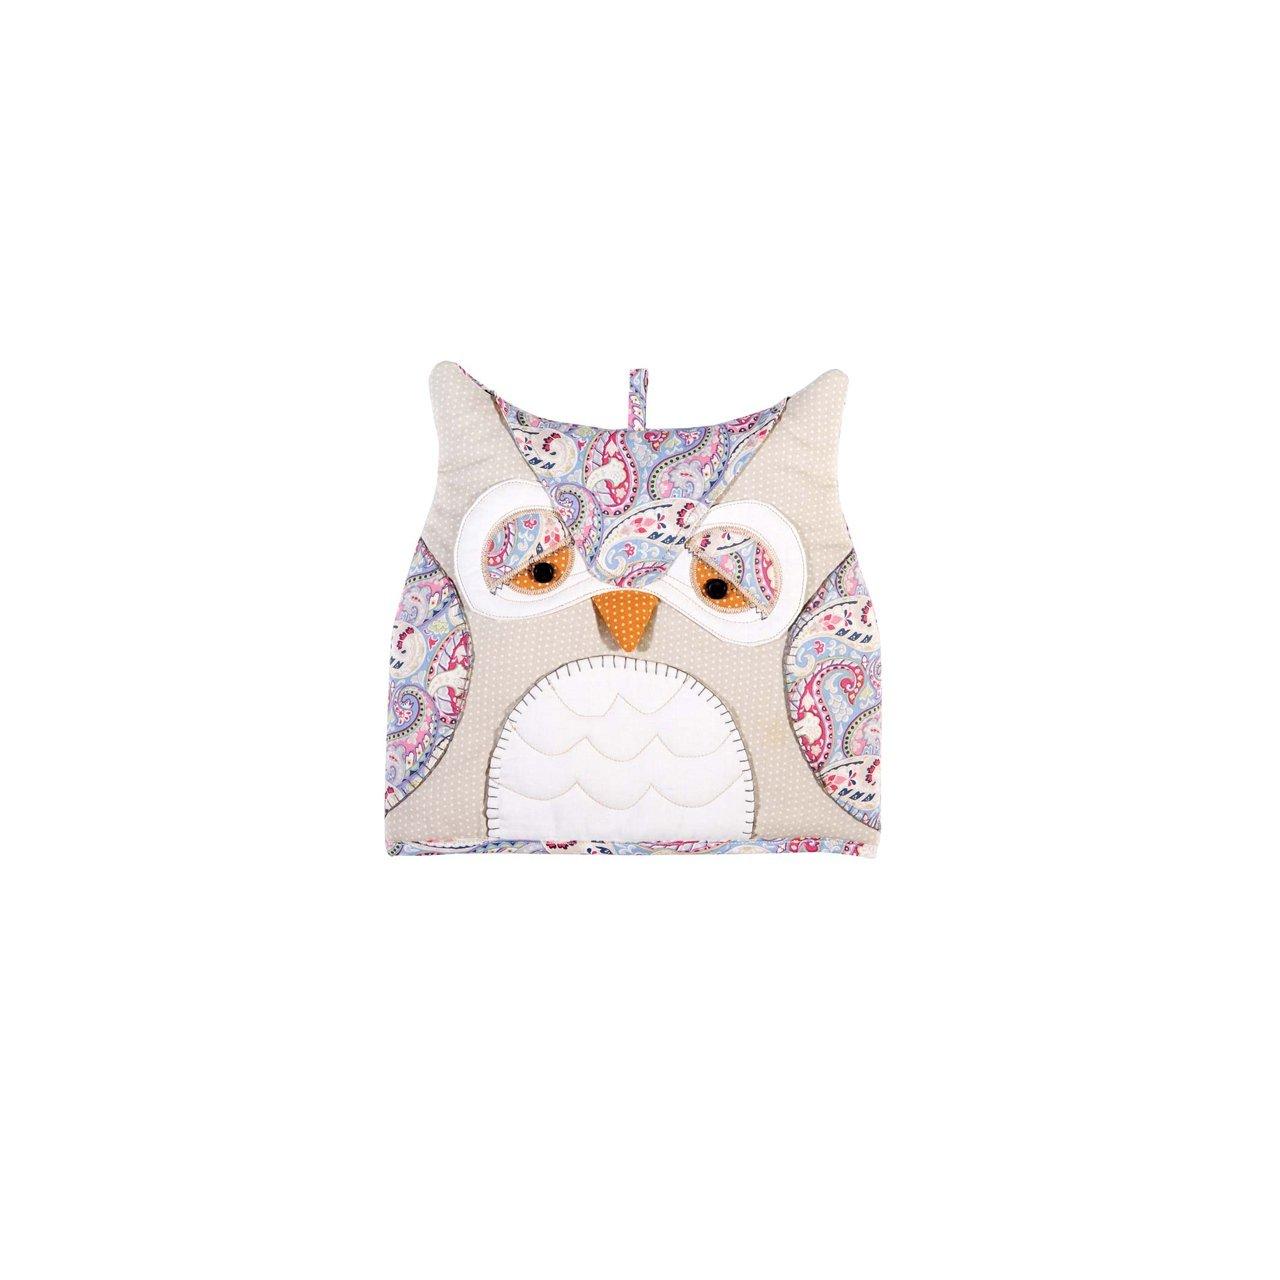 Ulster Weavers Owl Shaped Decorative Tea Cosy